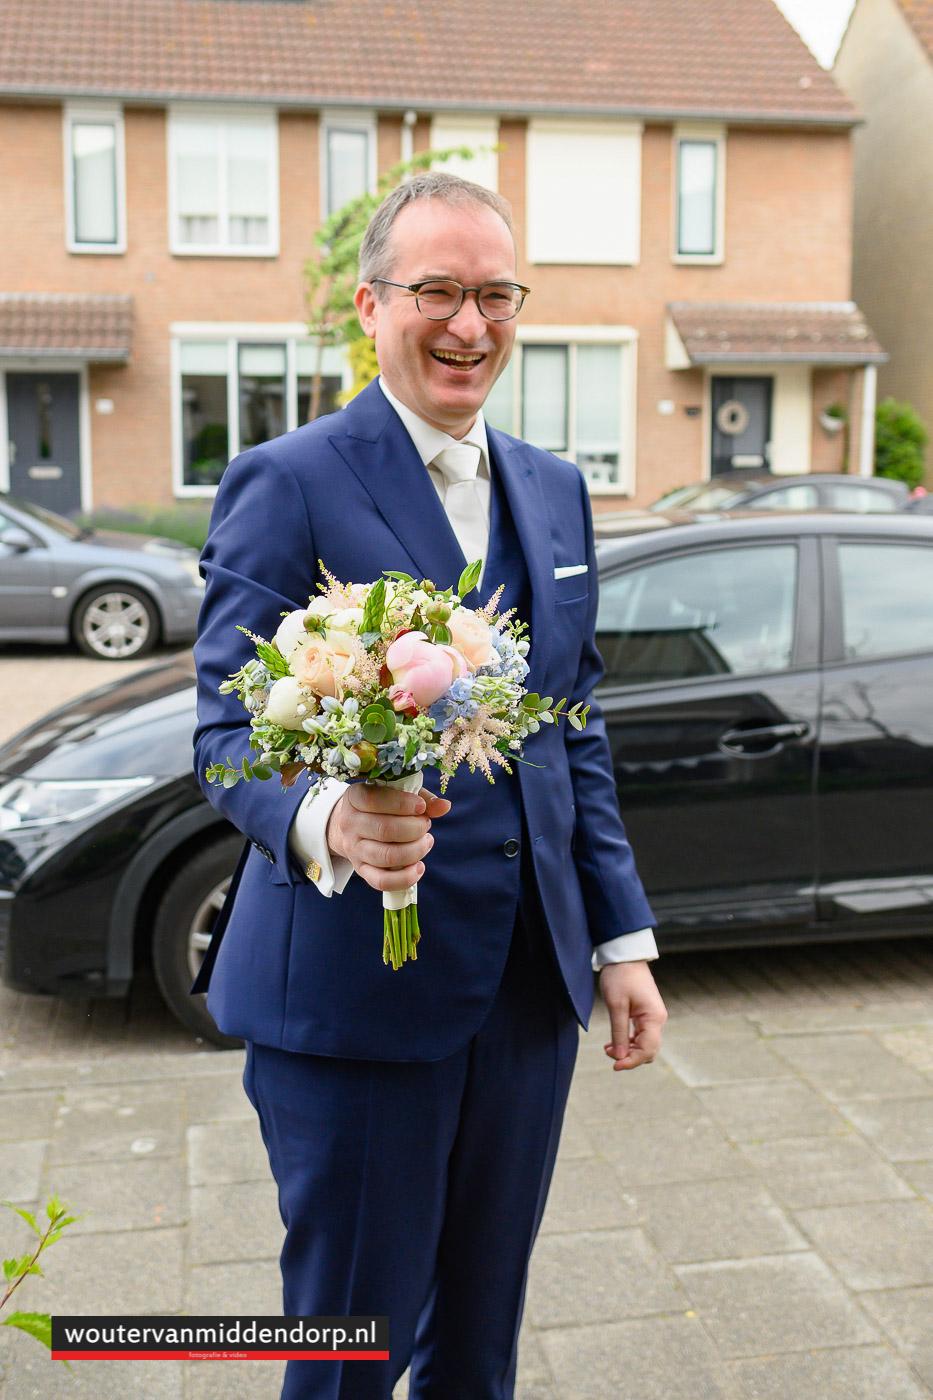 bruidsfotografie Wouter van Middendorp Uddel, Gorinchem, Ridderkerk-11